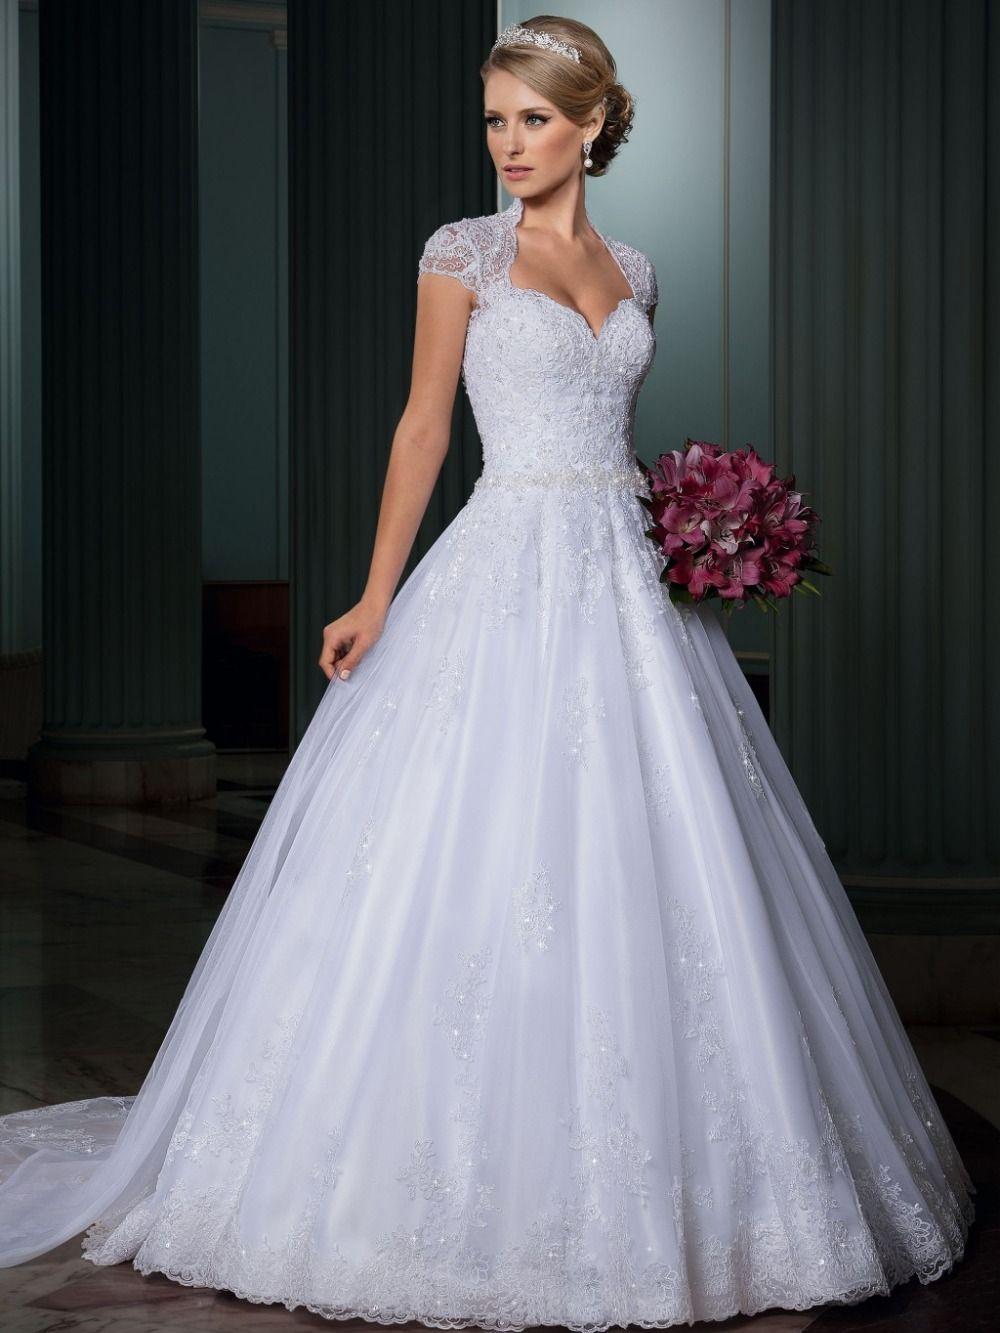 Open Back Lace Appliqued Ball Gown Wedding Dress | Lace applique ...